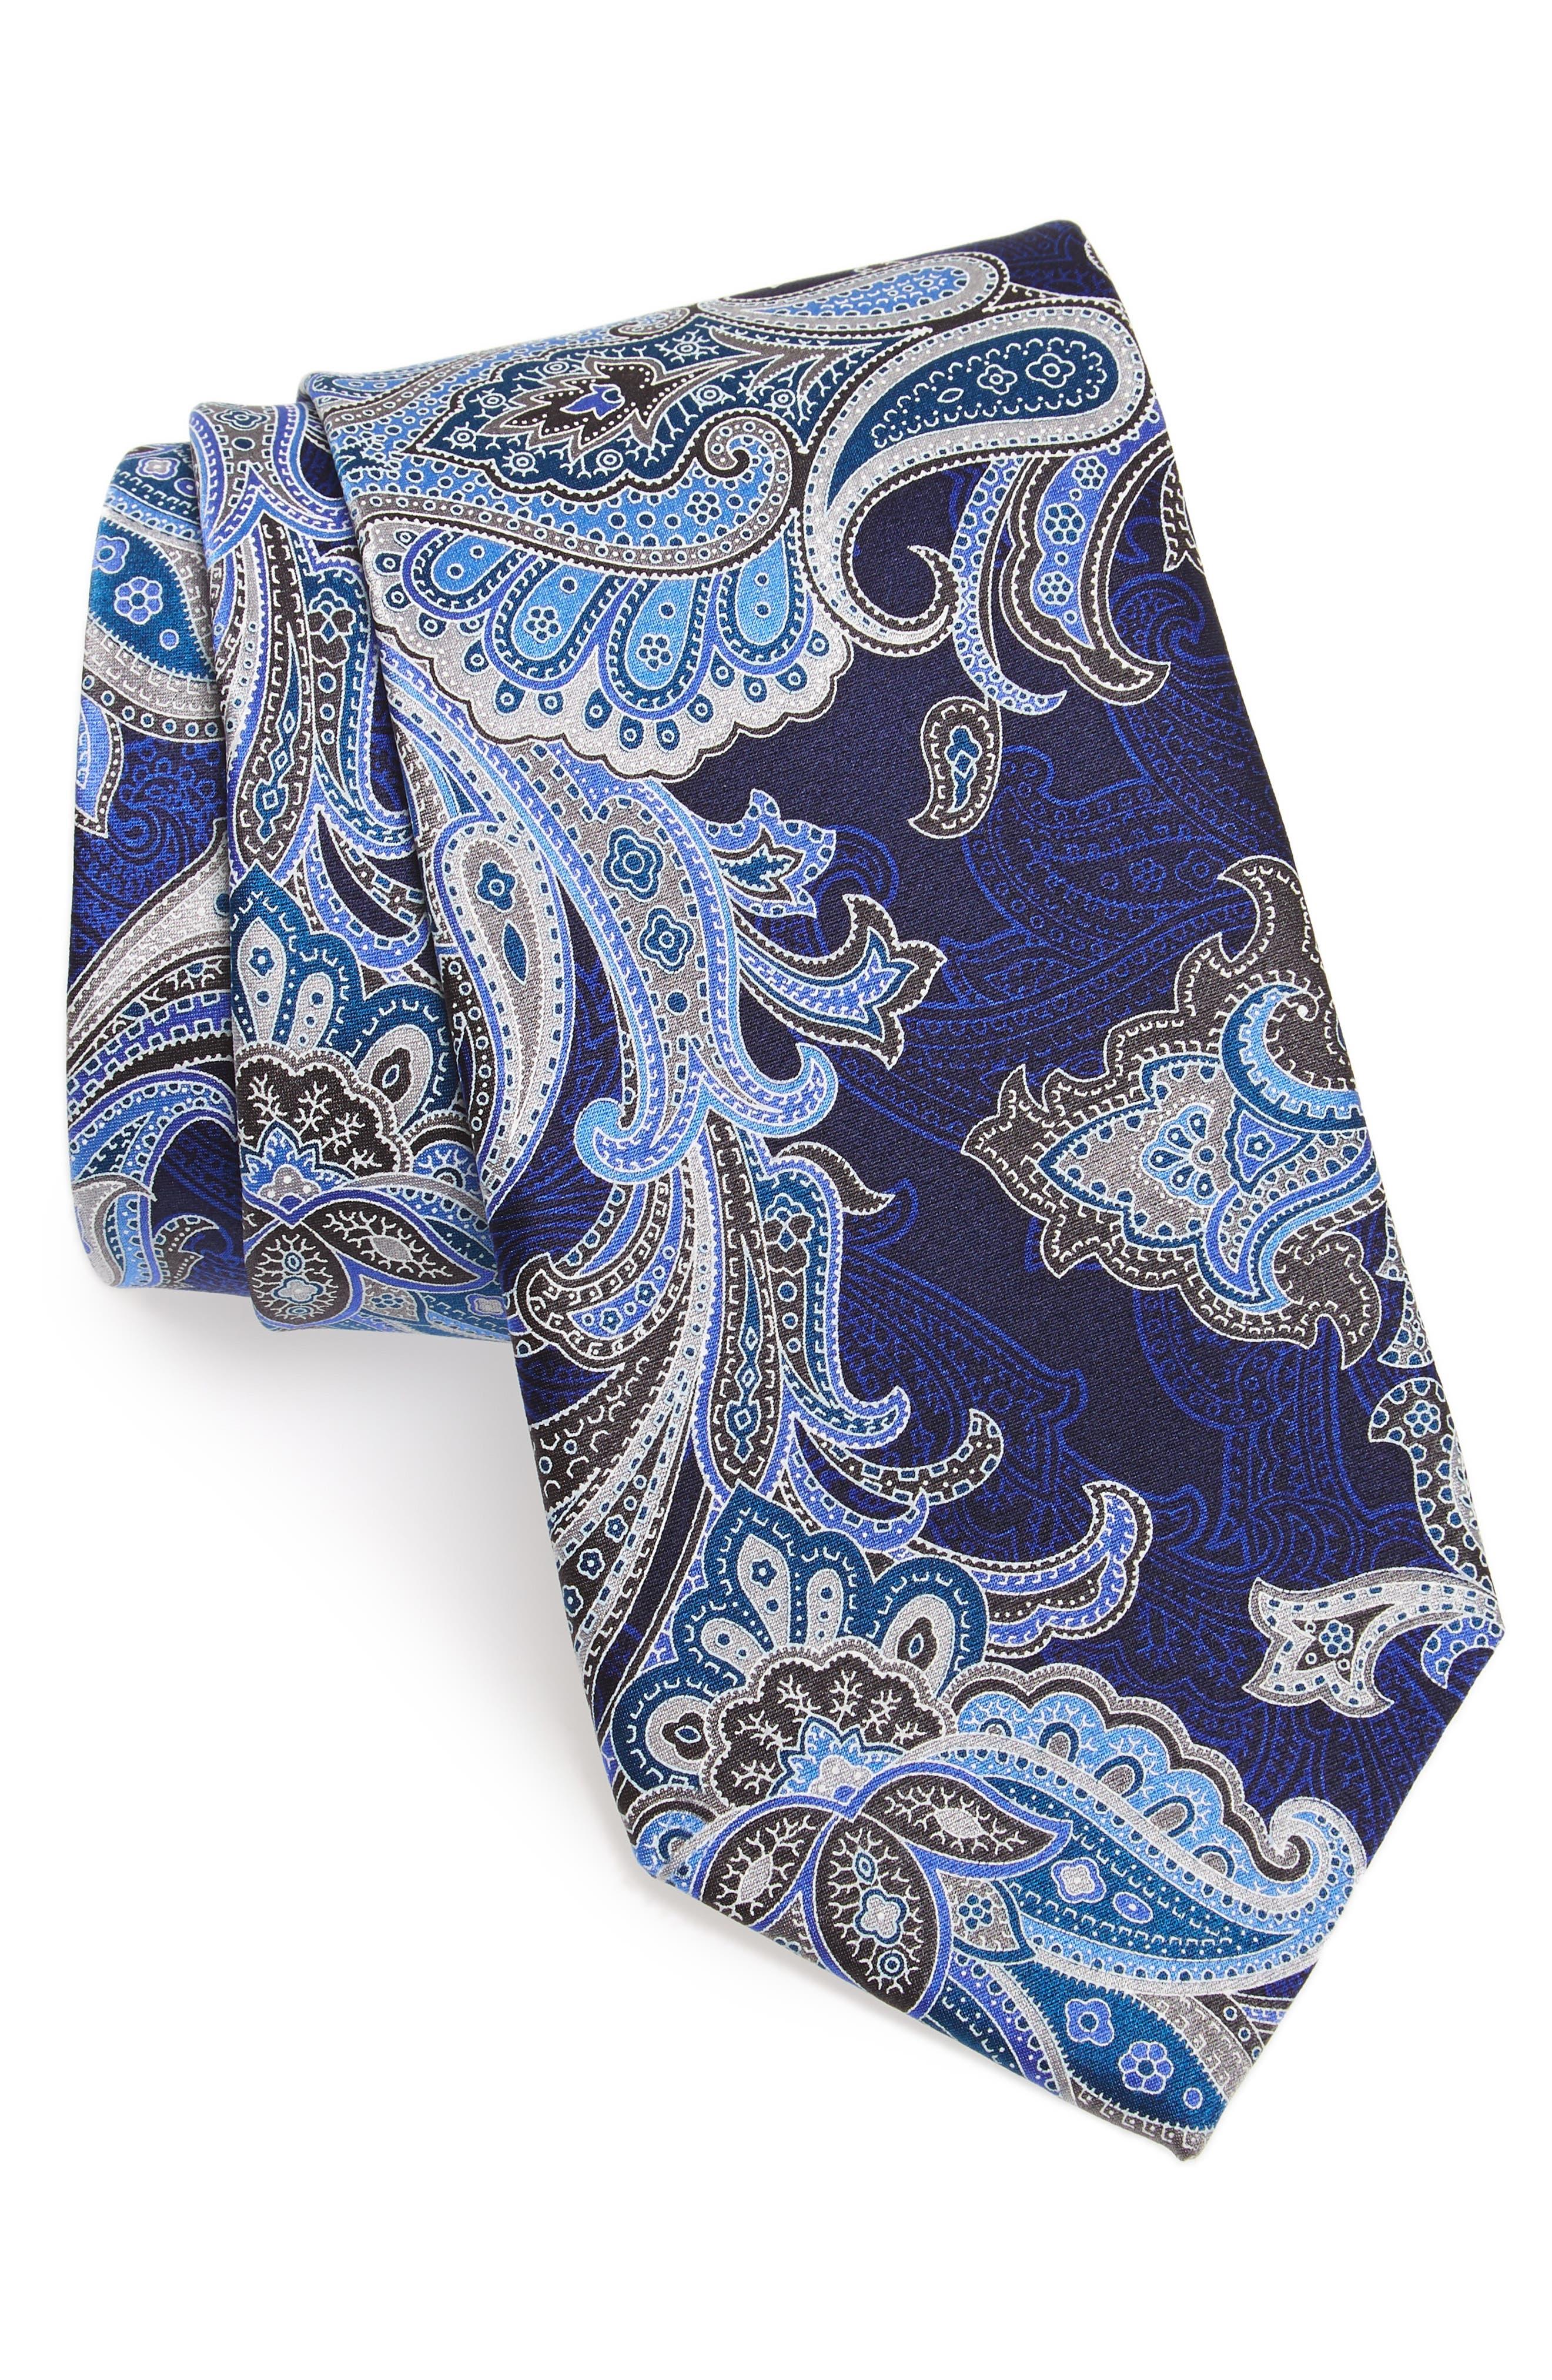 Penay Paisley Silk Tie,                             Main thumbnail 1, color,                             020